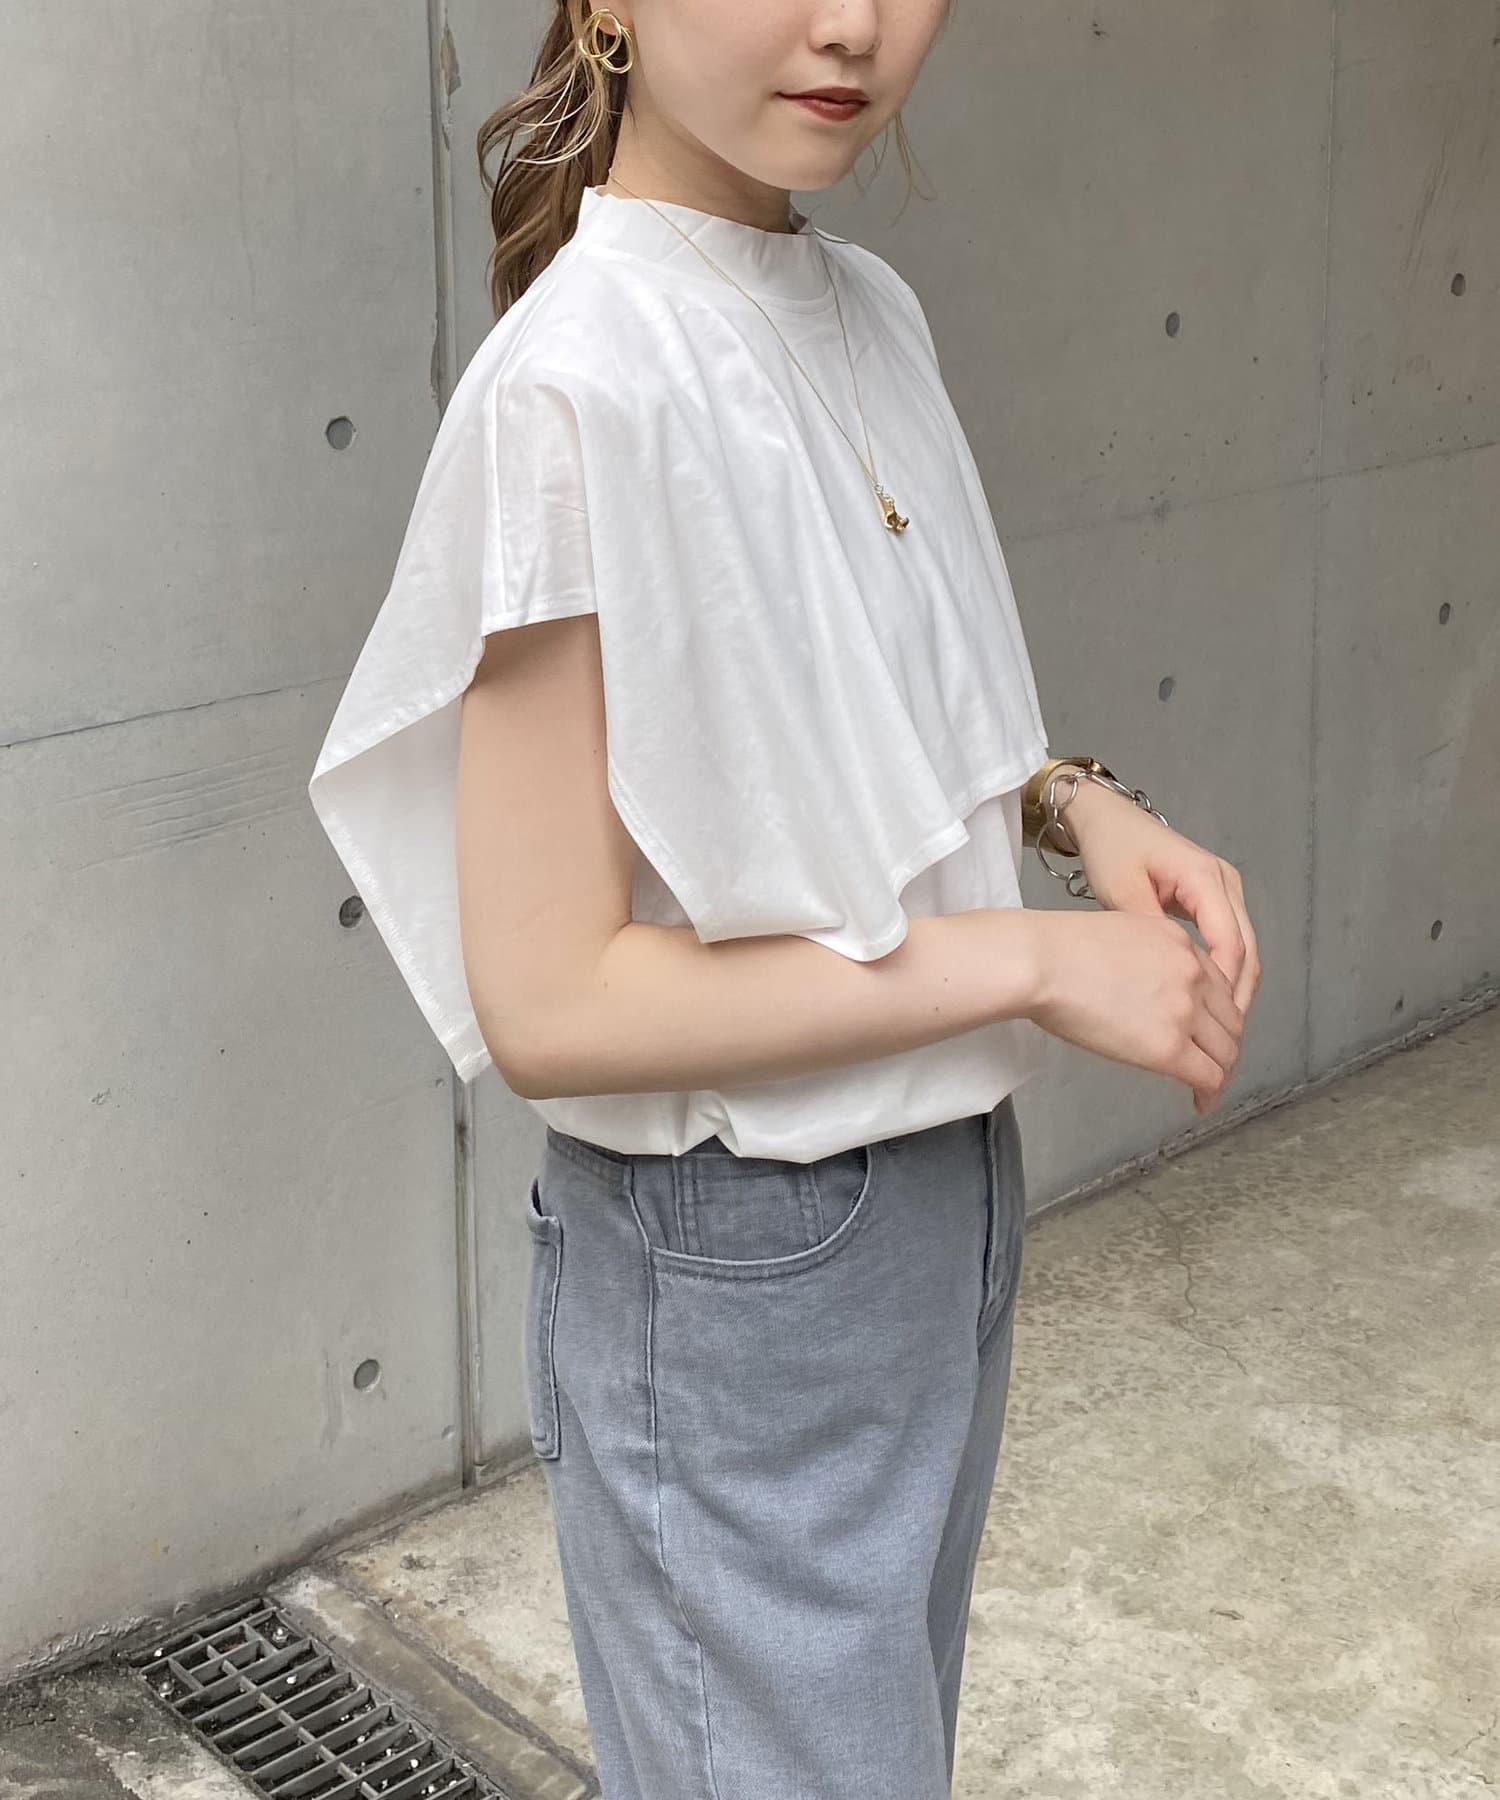 CAPRICIEUX LE'MAGE(カプリシュレマージュ) 〈WEB限定〉スクエアケープTシャツ